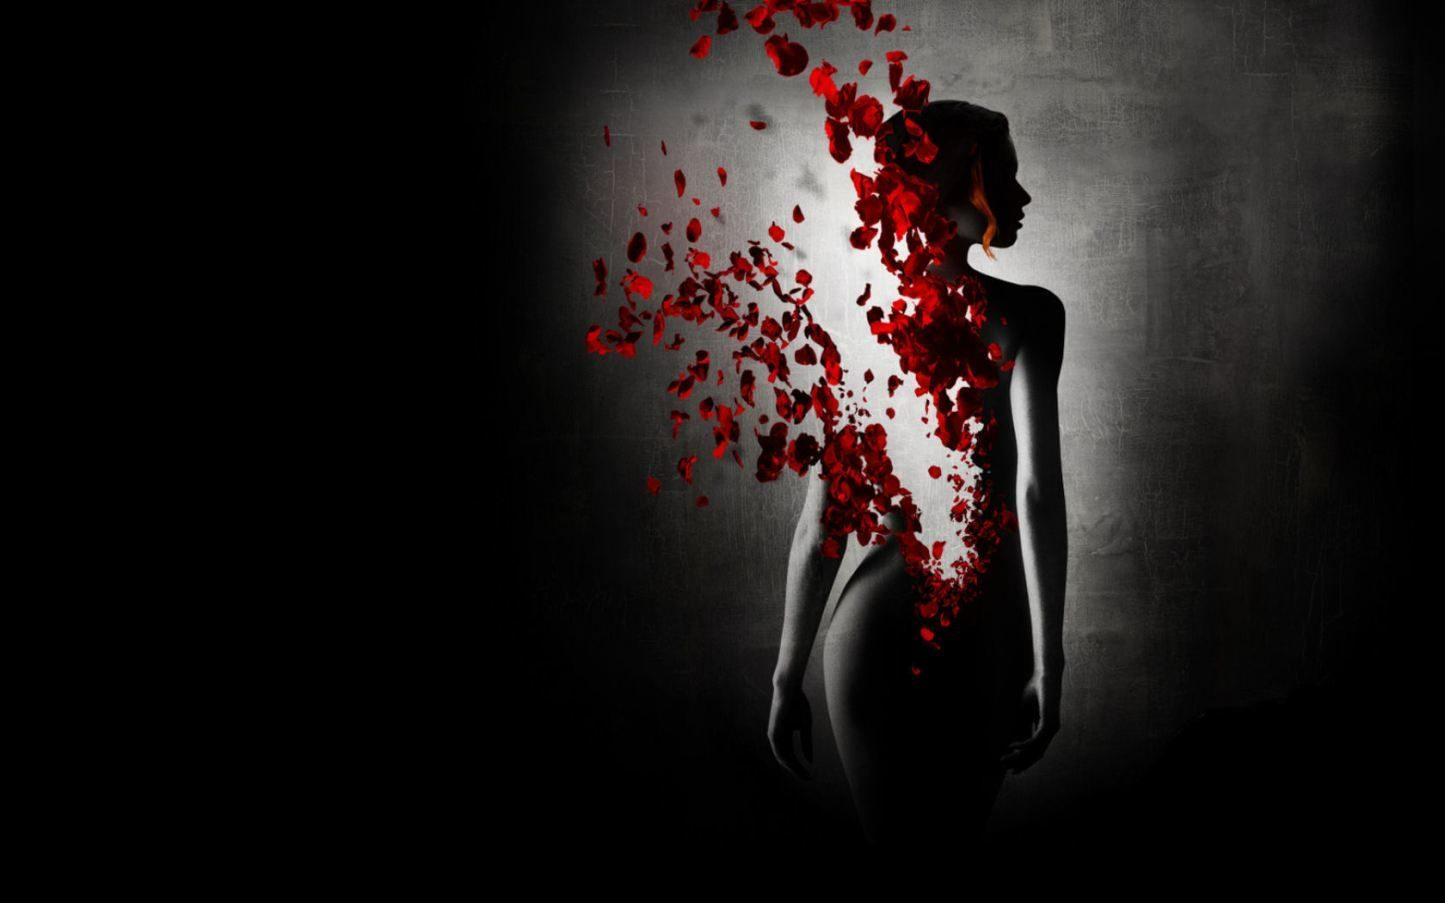 mujer y rosa roja - photo #22